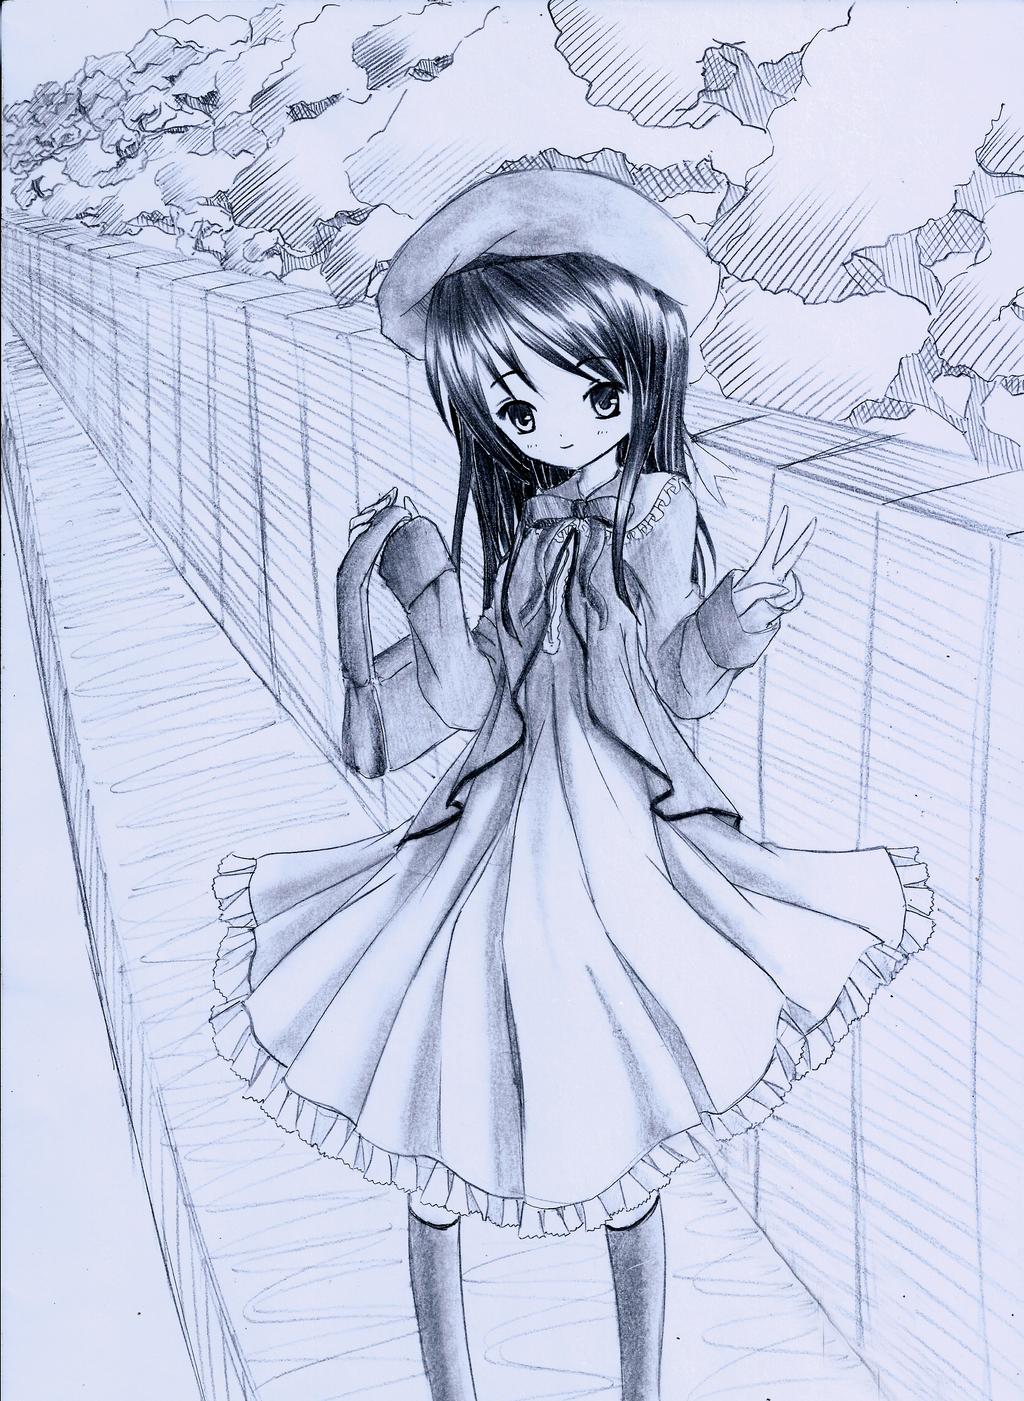 Cute girl smiling by Kudo008